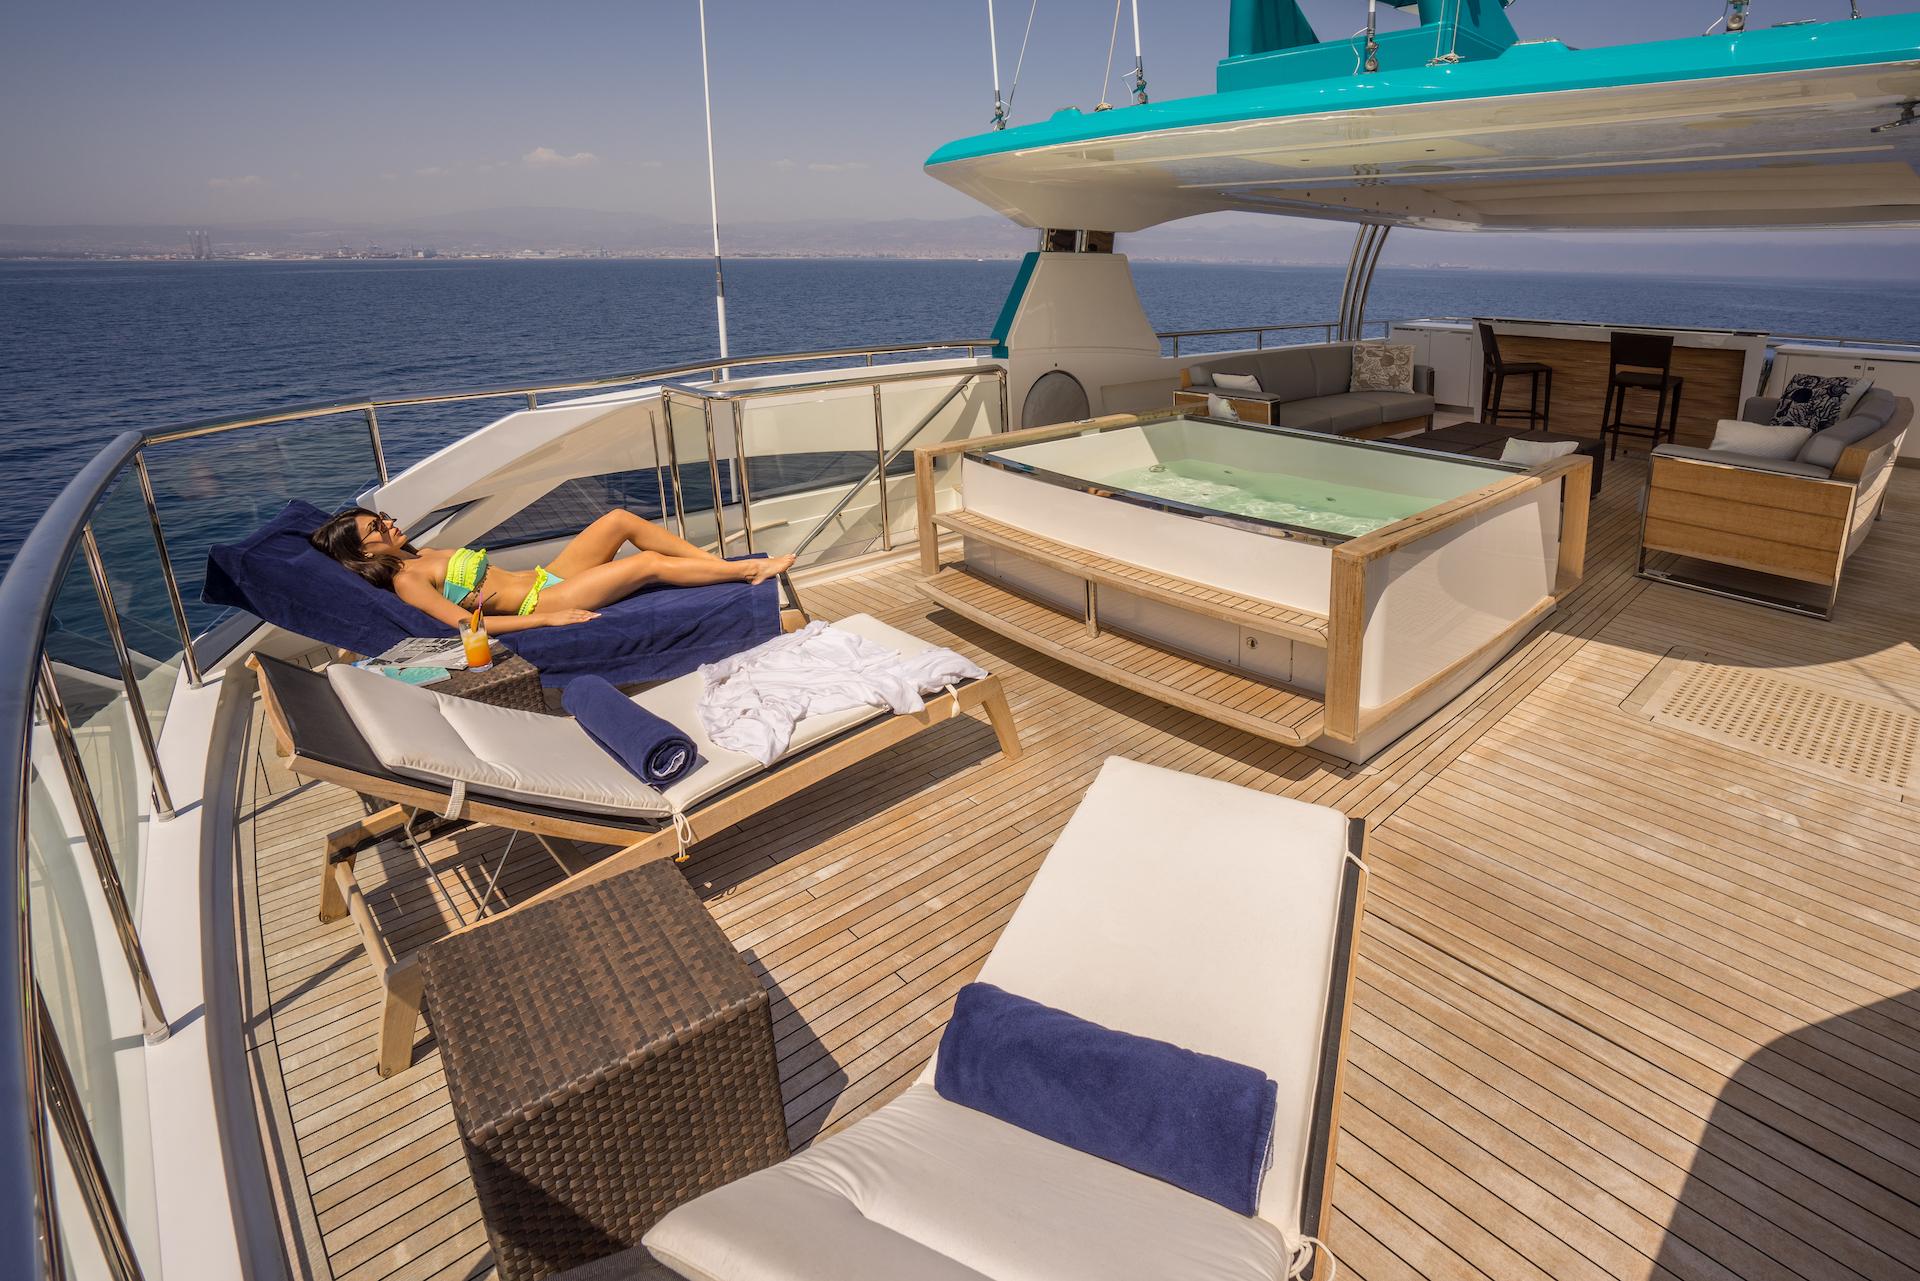 Jacuzzi Lifestyle On Sun Deck